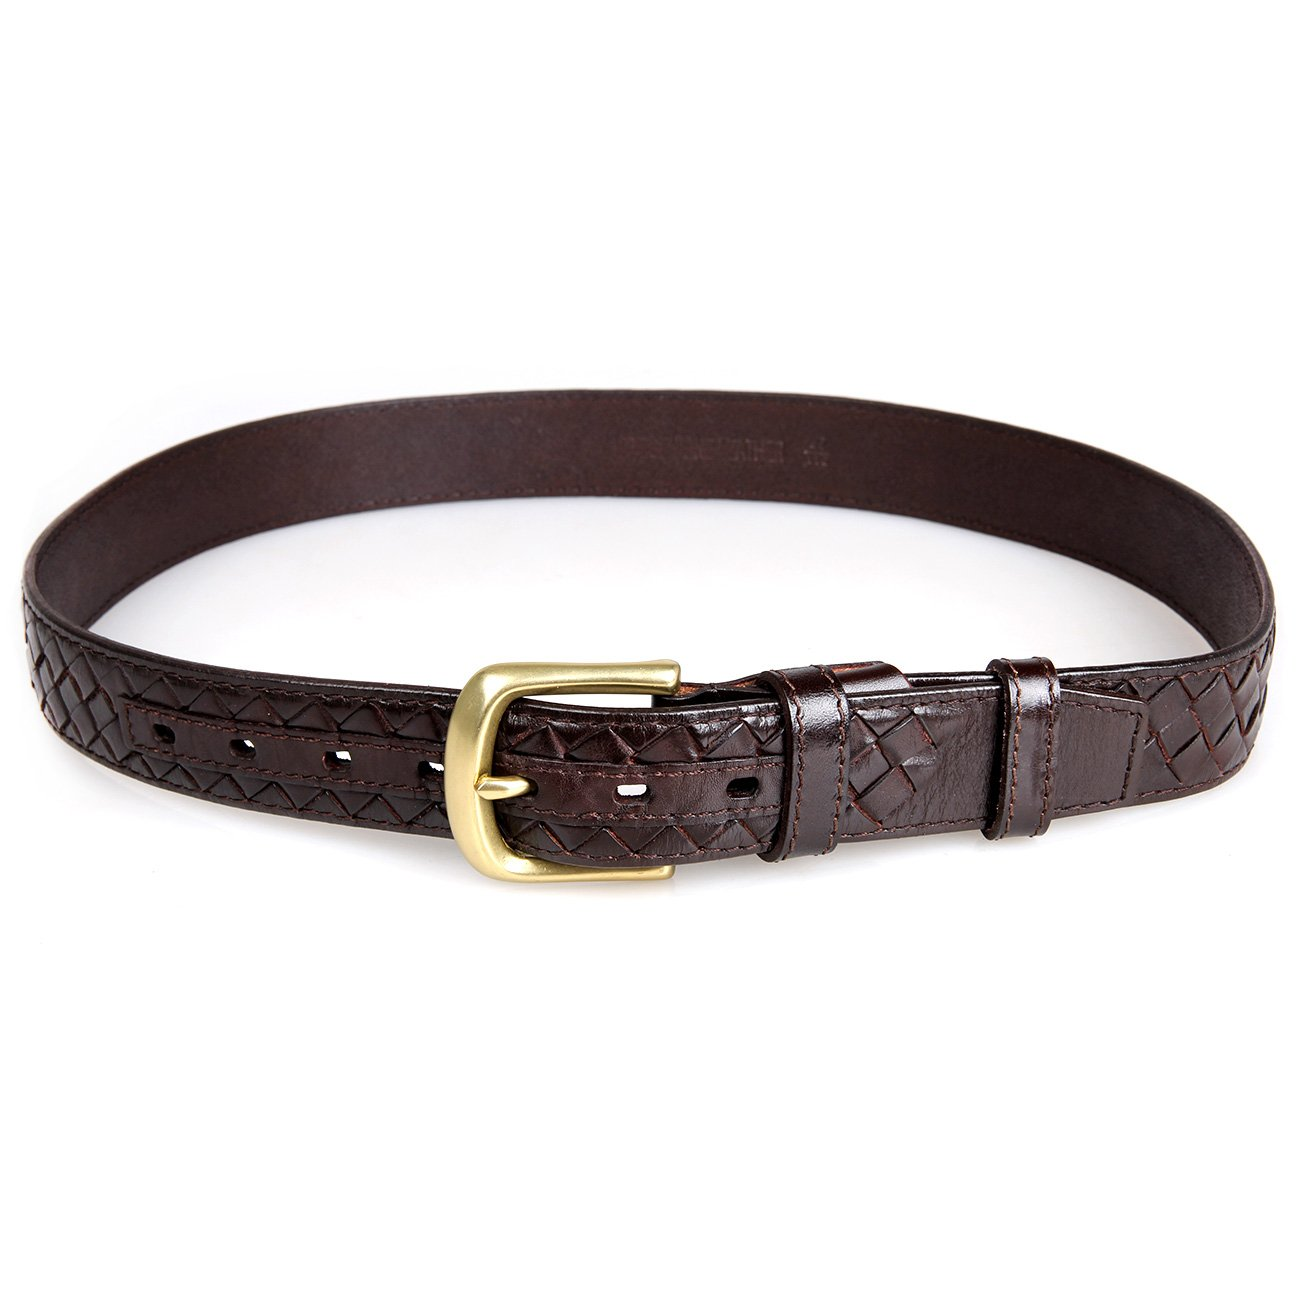 Genda 2Archer Fashion Weave Style Men Vegetable Leather Belt With Making-hole Machine